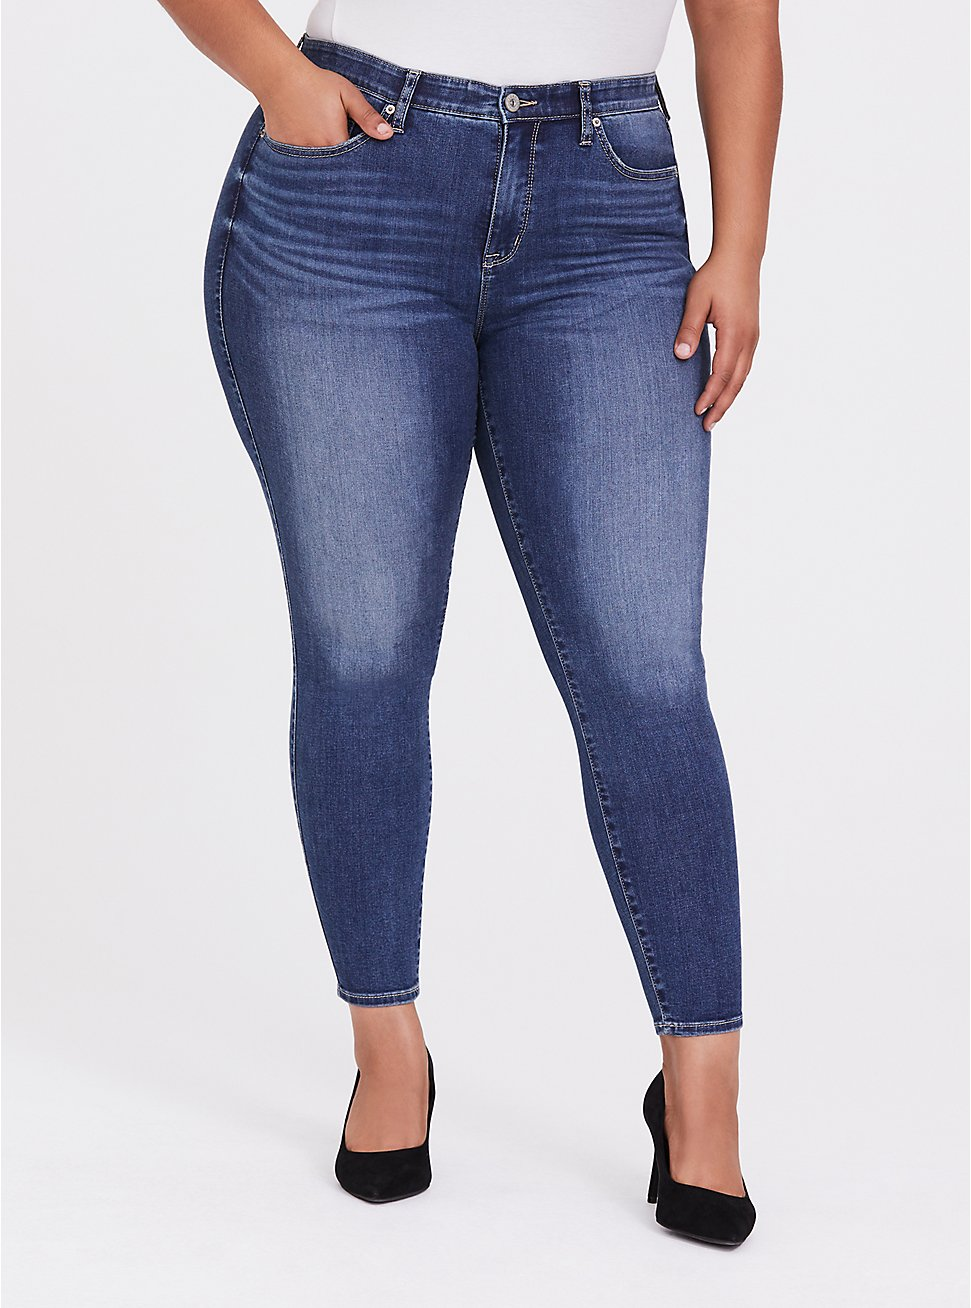 Sky High Skinny Jean - Super Soft Medium Wash, , hi-res